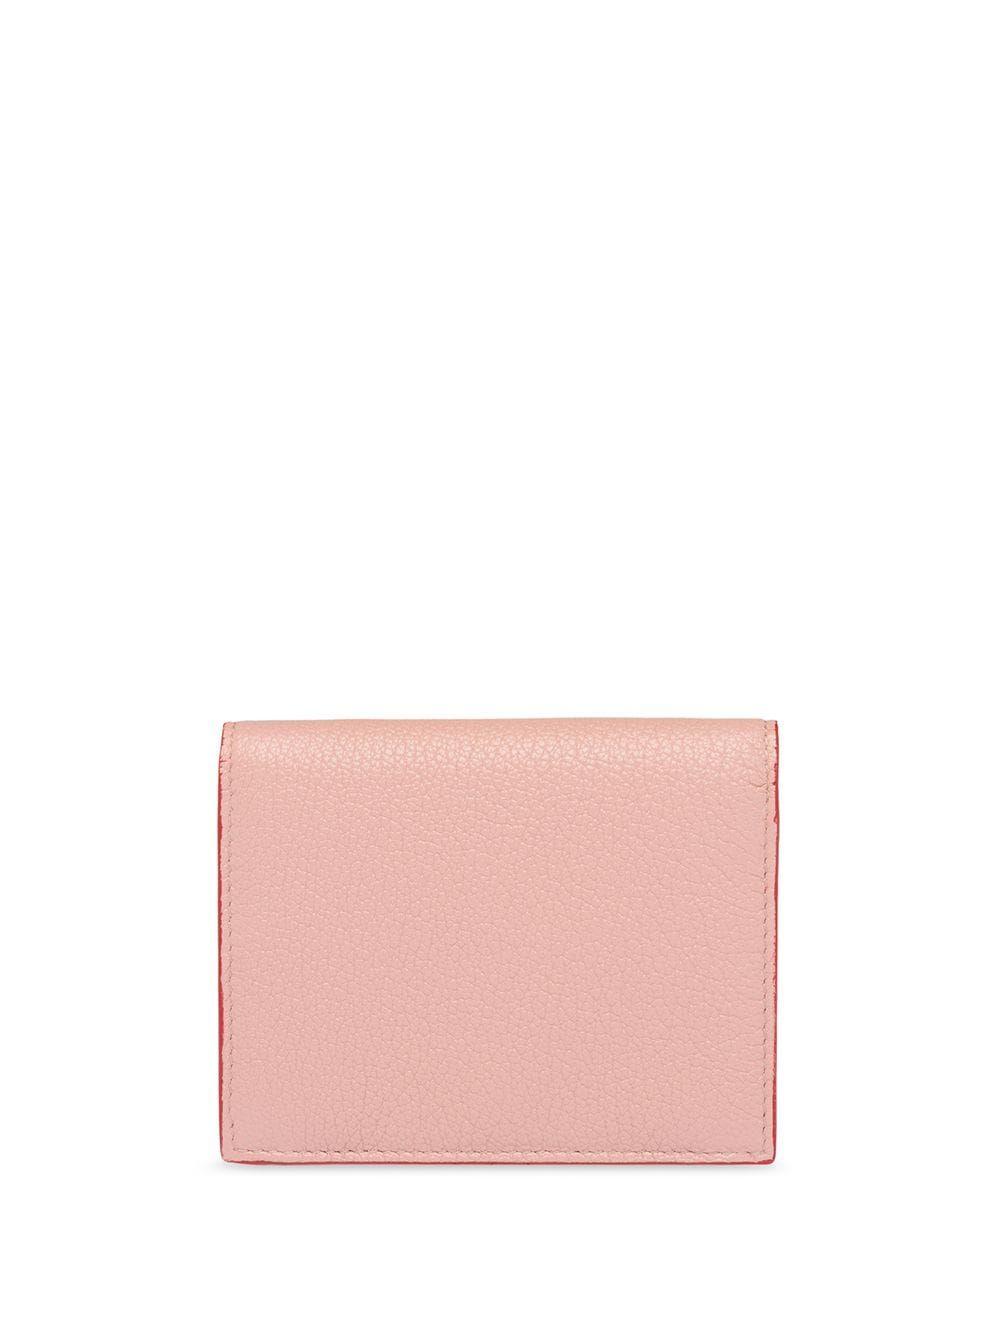 MIU MIU Wallets MIU MIU WOMEN'S PINK LEATHER WALLET